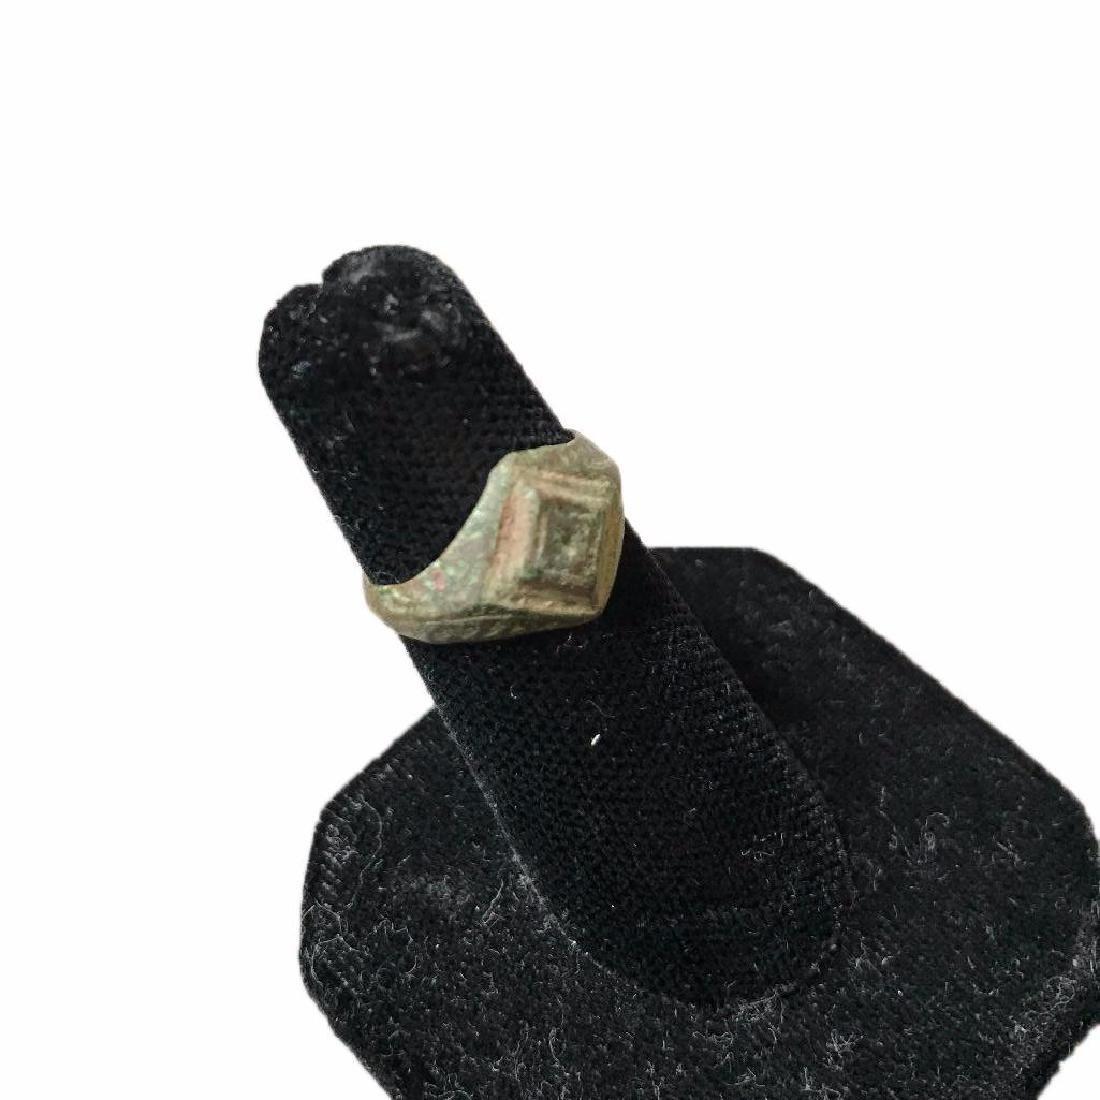 300-400 AD Ancient Roman Bronze Ring - 2